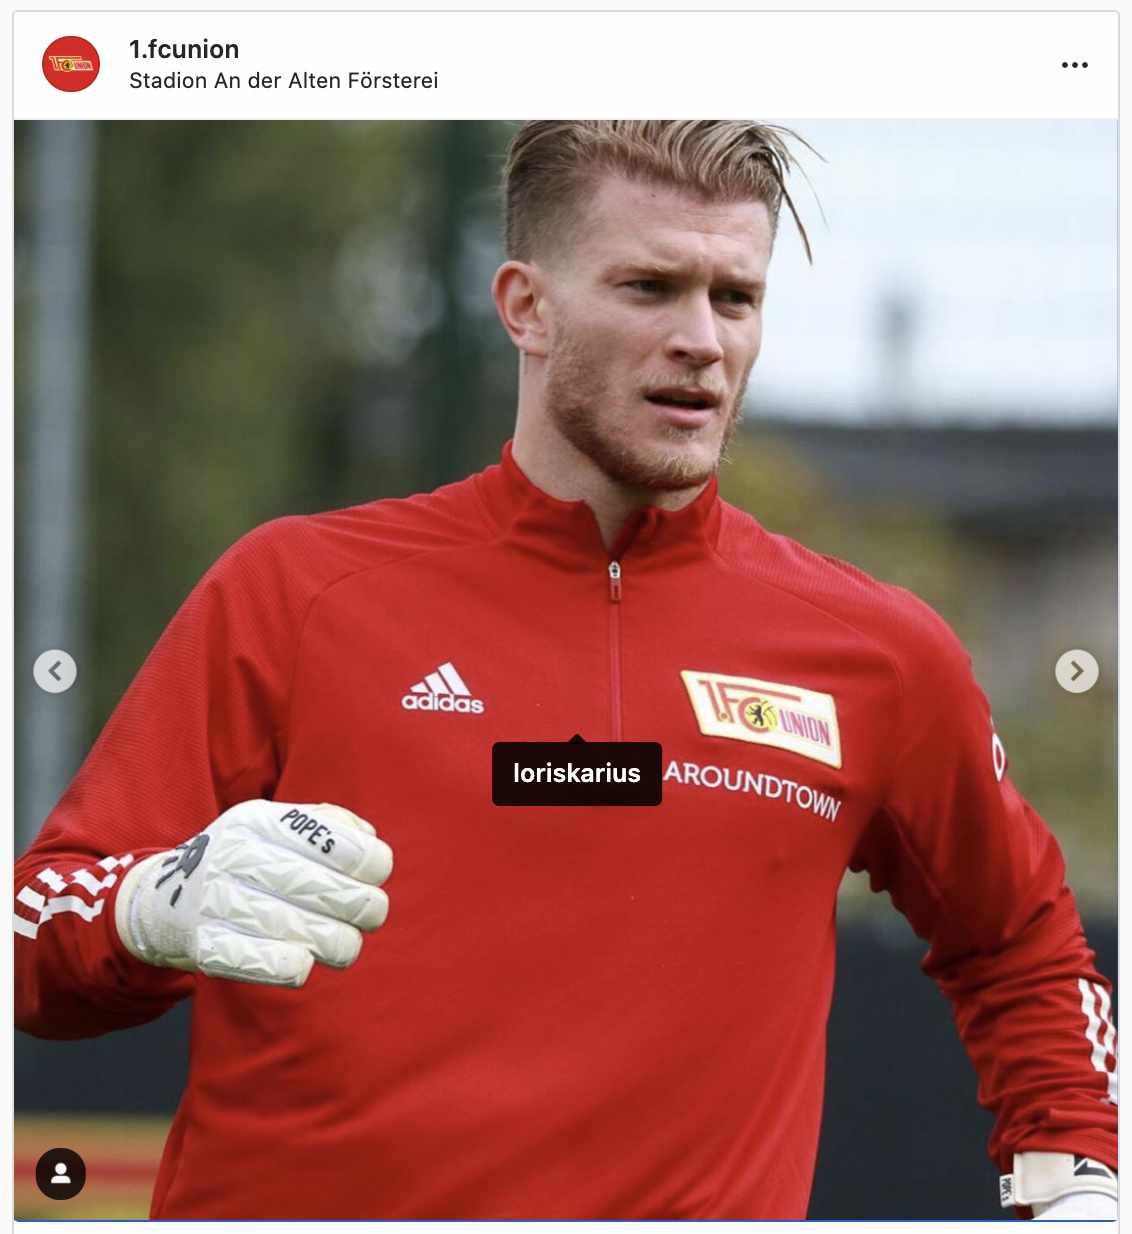 Union Berlin Loris Karius - Liverpool Confirm Loan Exit For Loris Karius The42 : Tout sur loris karius : |Thoran-oilmen